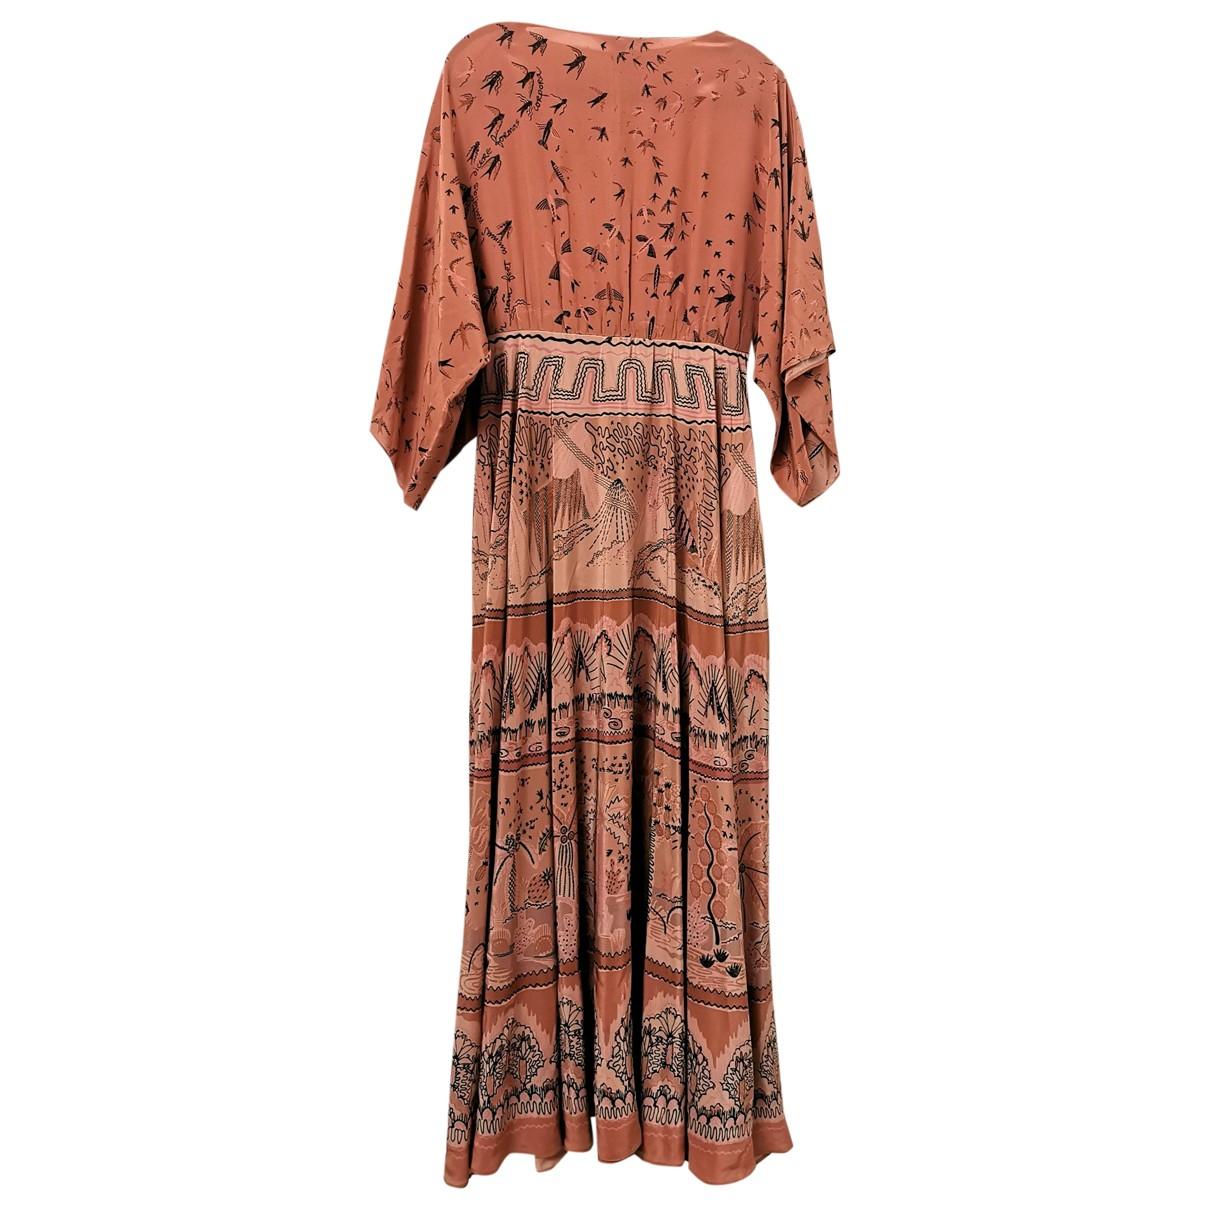 Valentino Garavani - Robe   pour femme en soie - marron